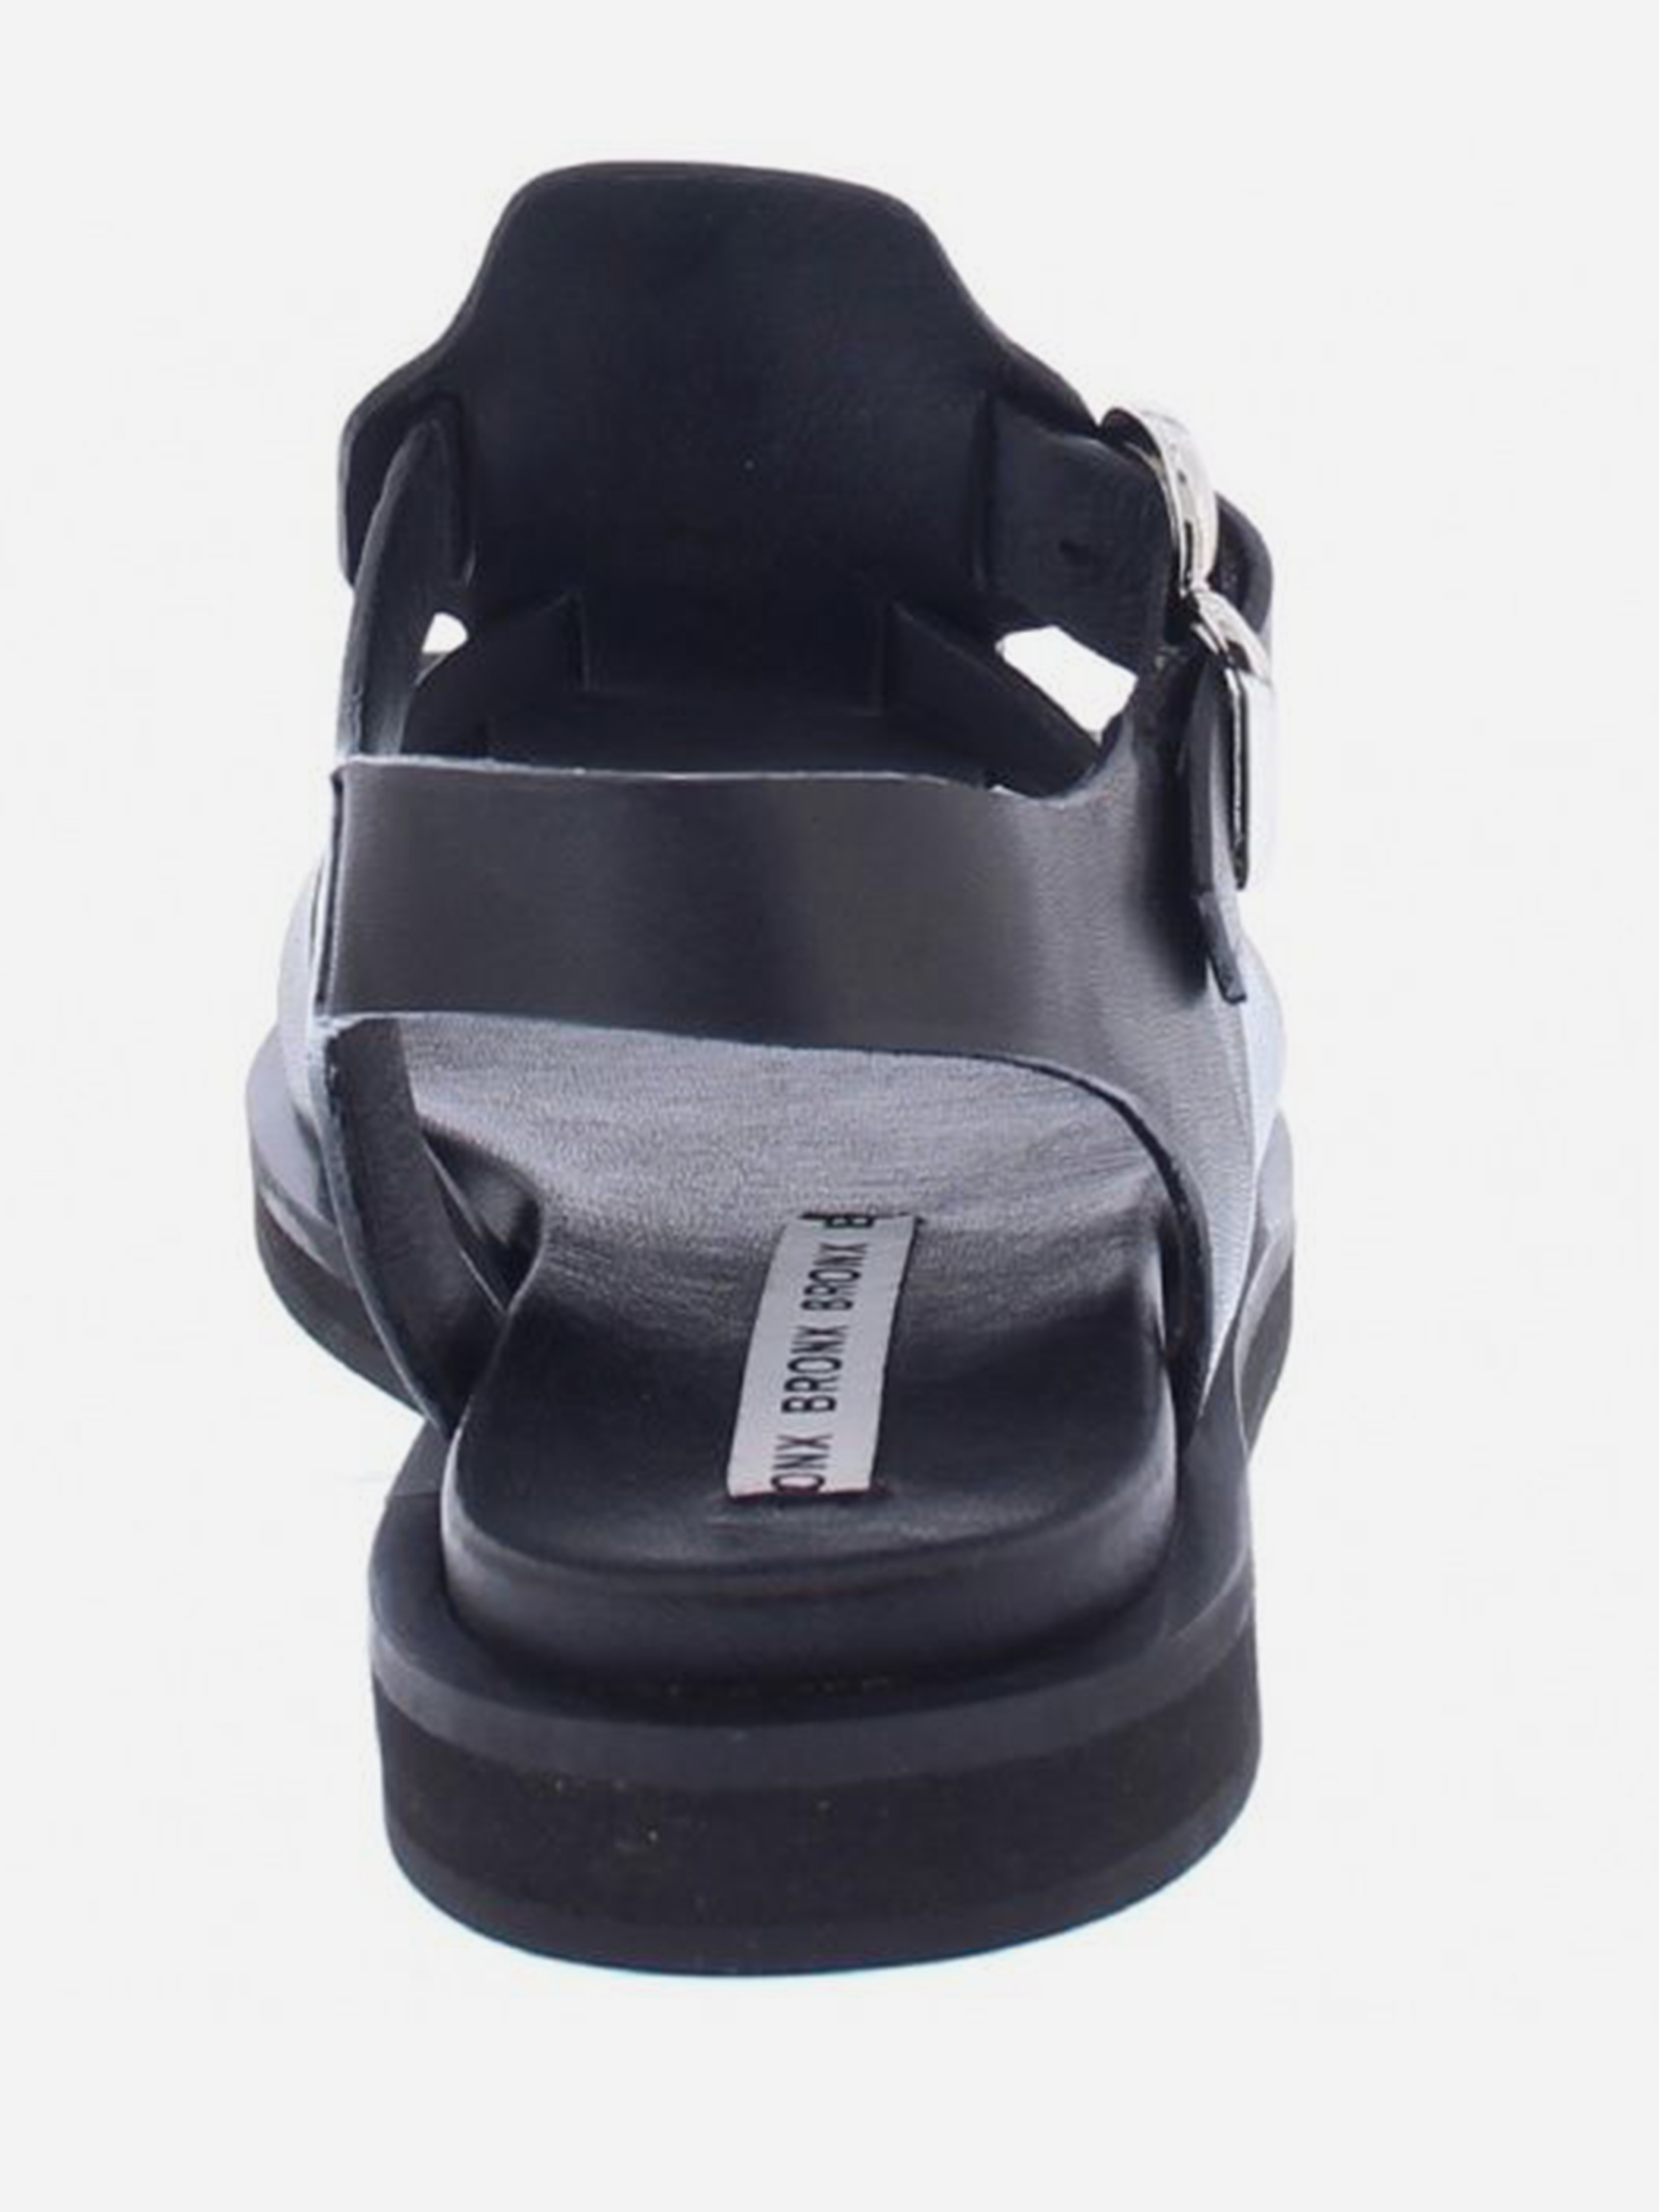 Сандалии для женщин Bronx BbalaX BX2051 брендовая обувь, 2017